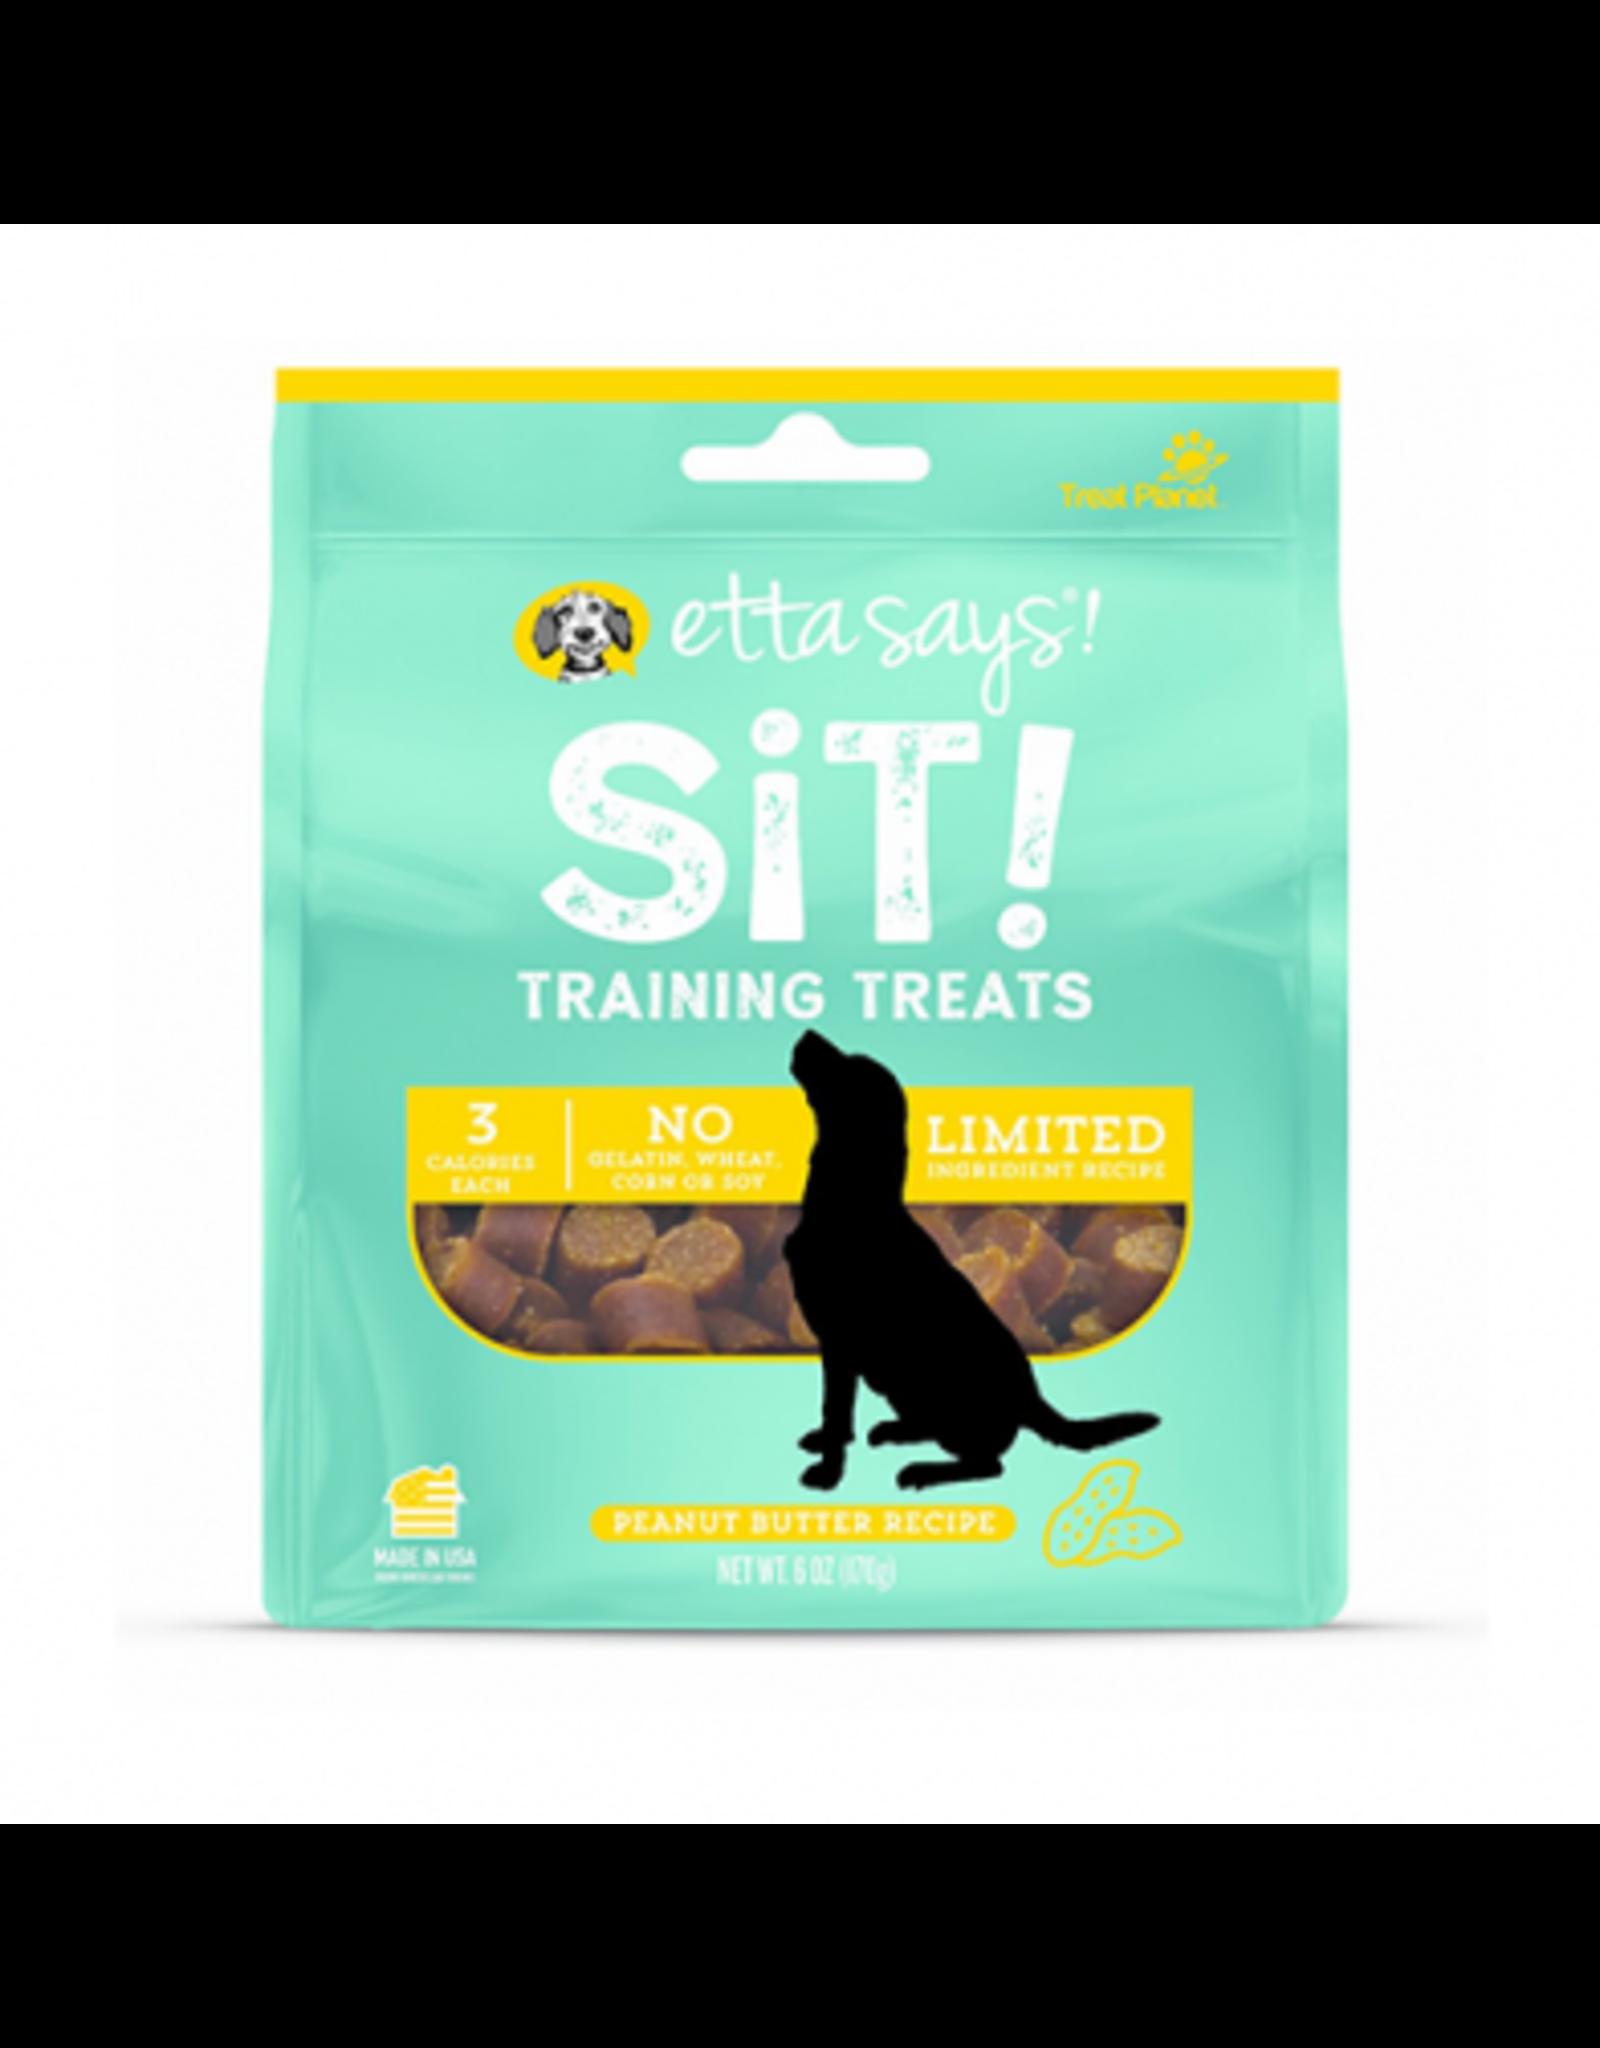 Etta Says! Etta Says Sit Dog Training Treats